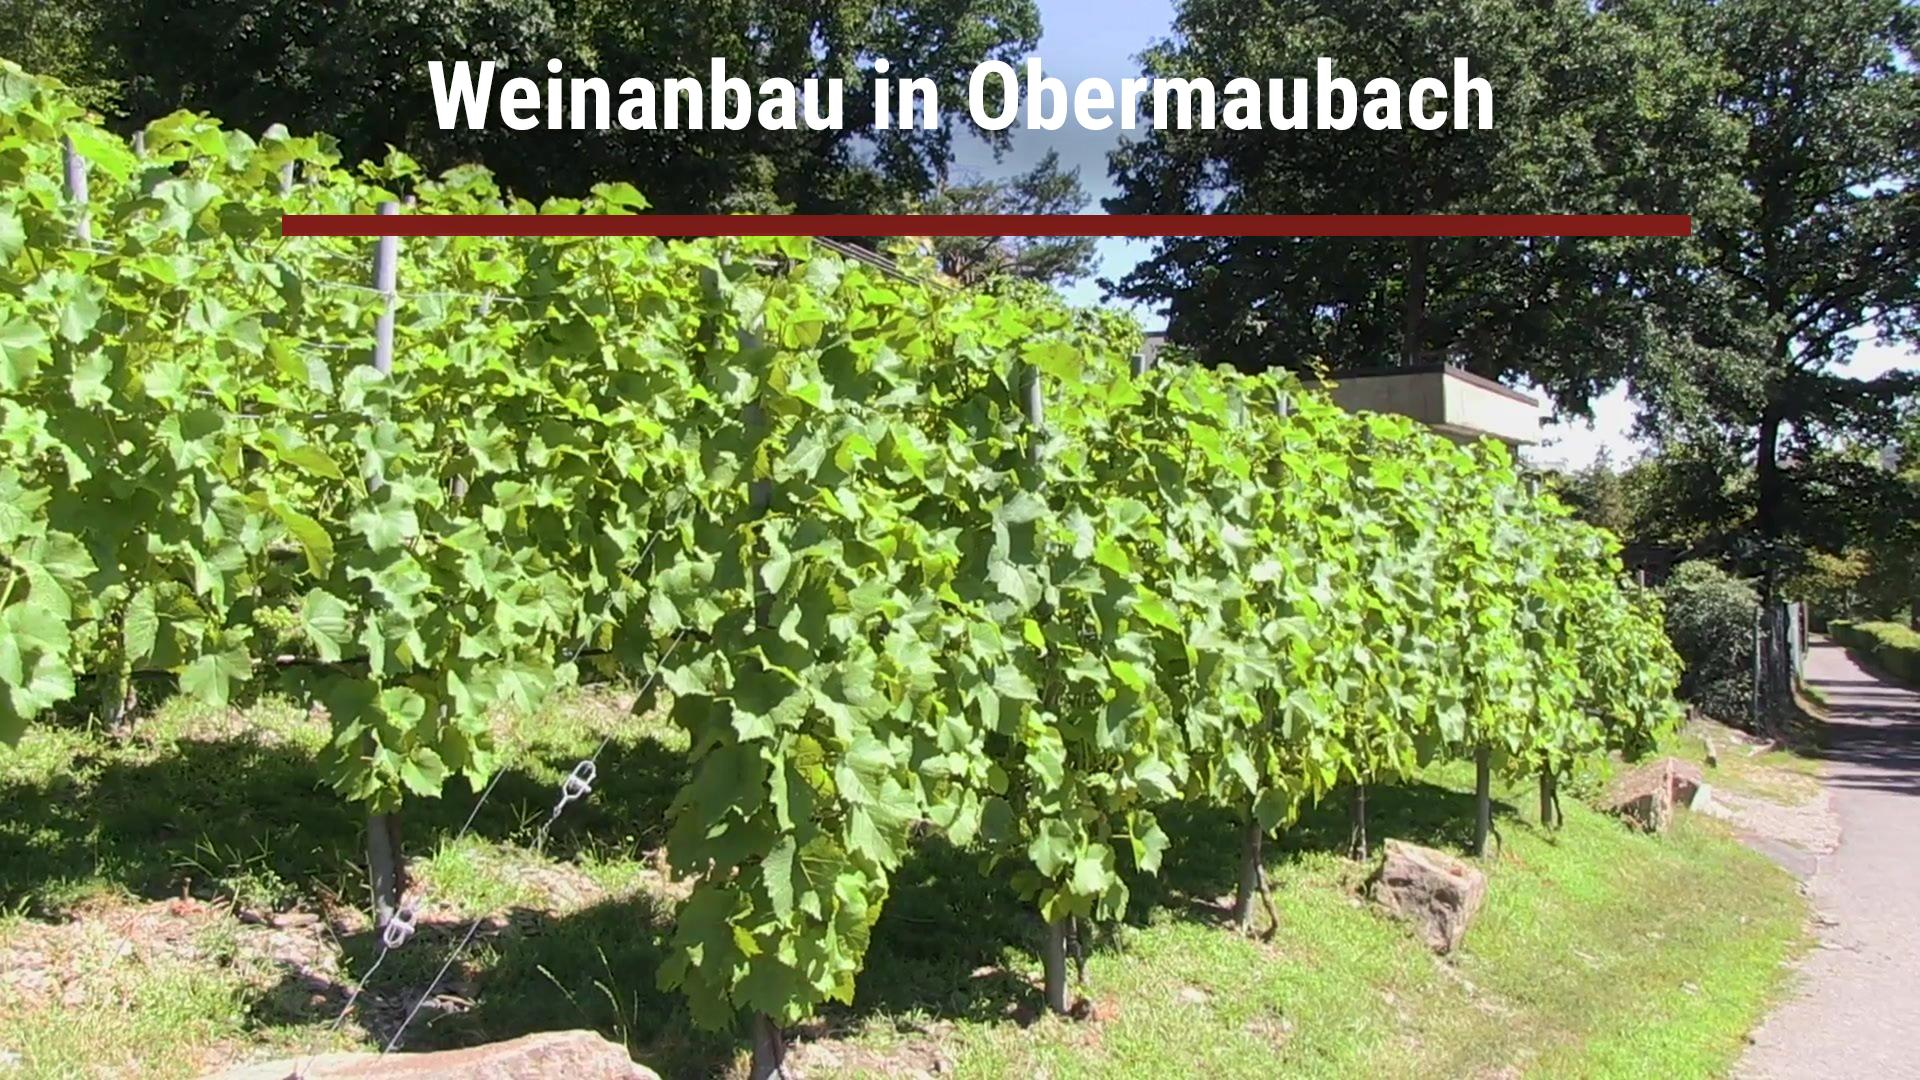 Weinanbau in Obermaubach